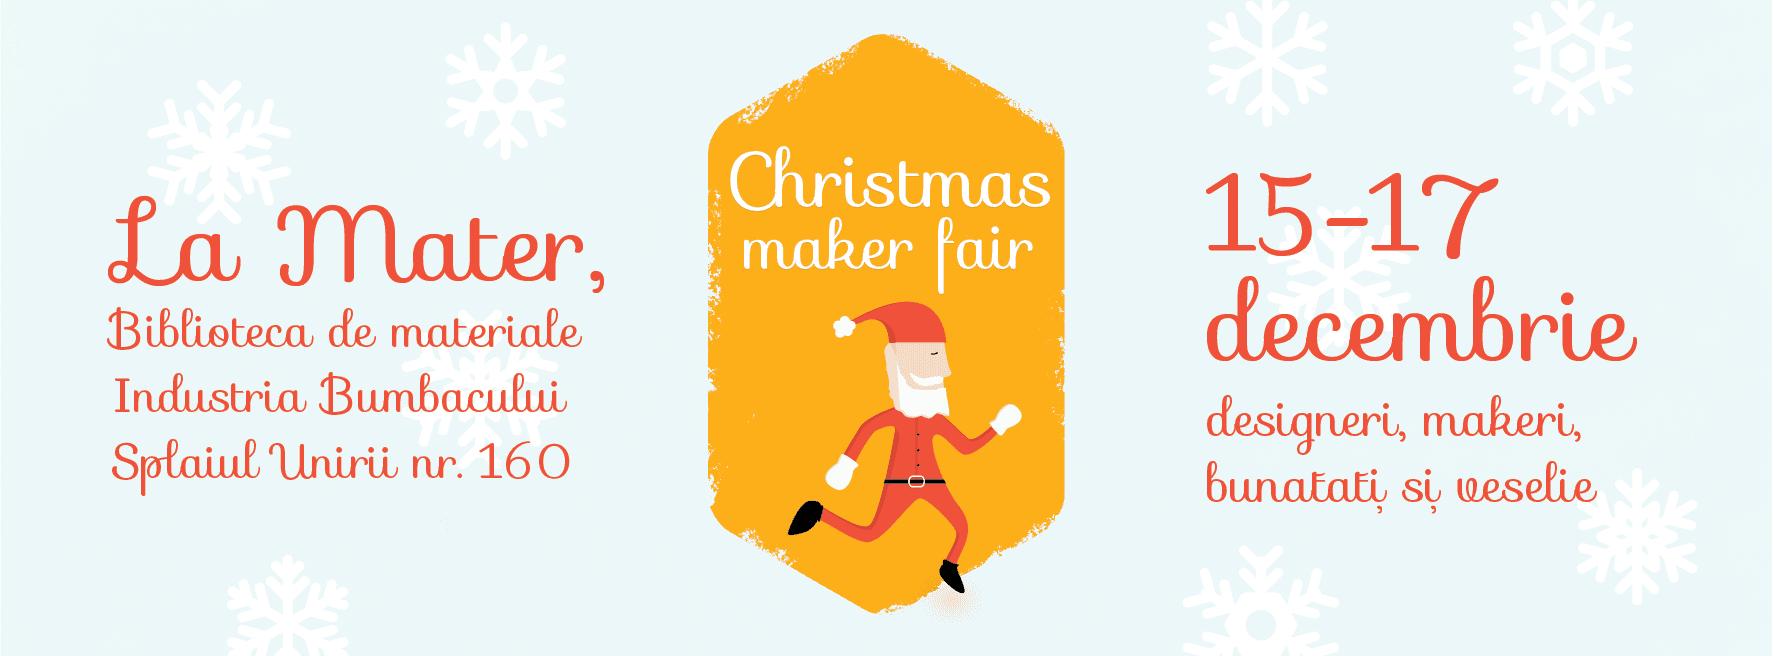 christmas maker fair mater